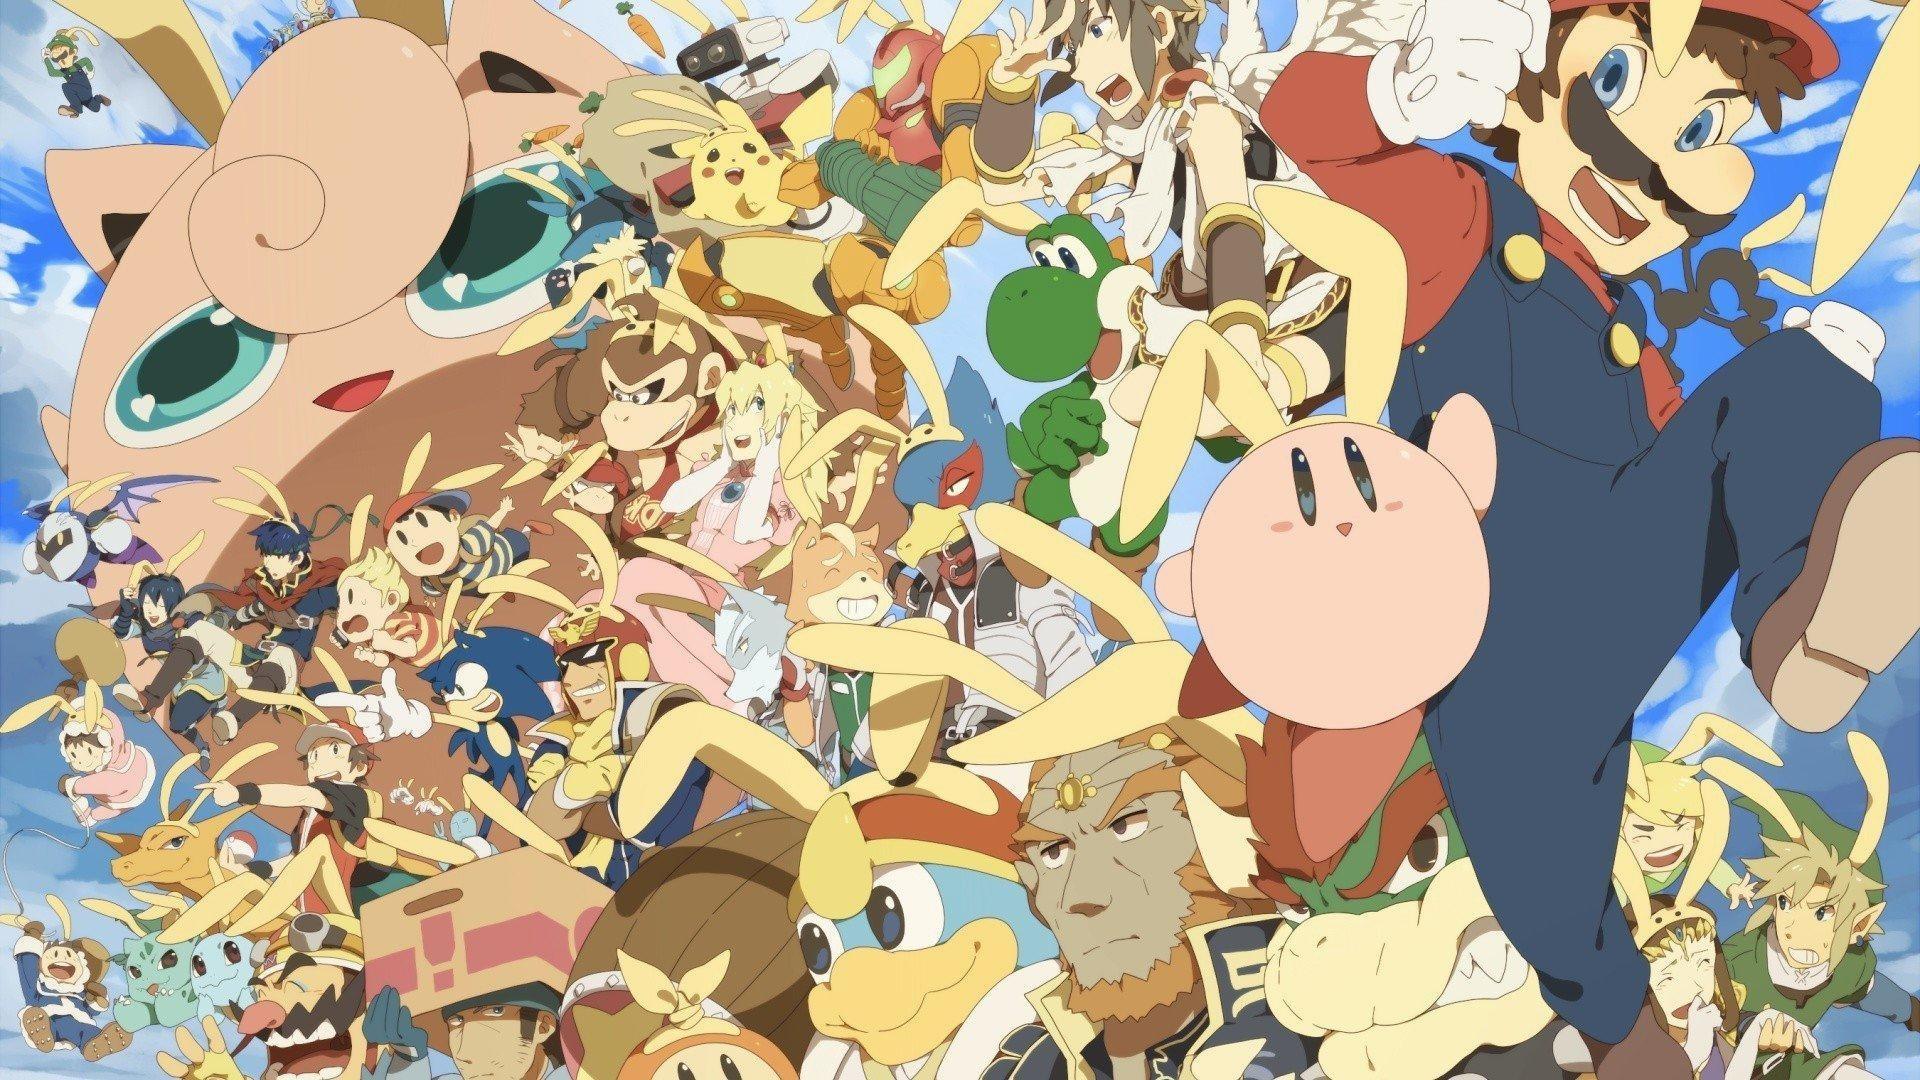 wallpaper.wiki-Best-Super-Smash-Bros-HD-Wallpaper-